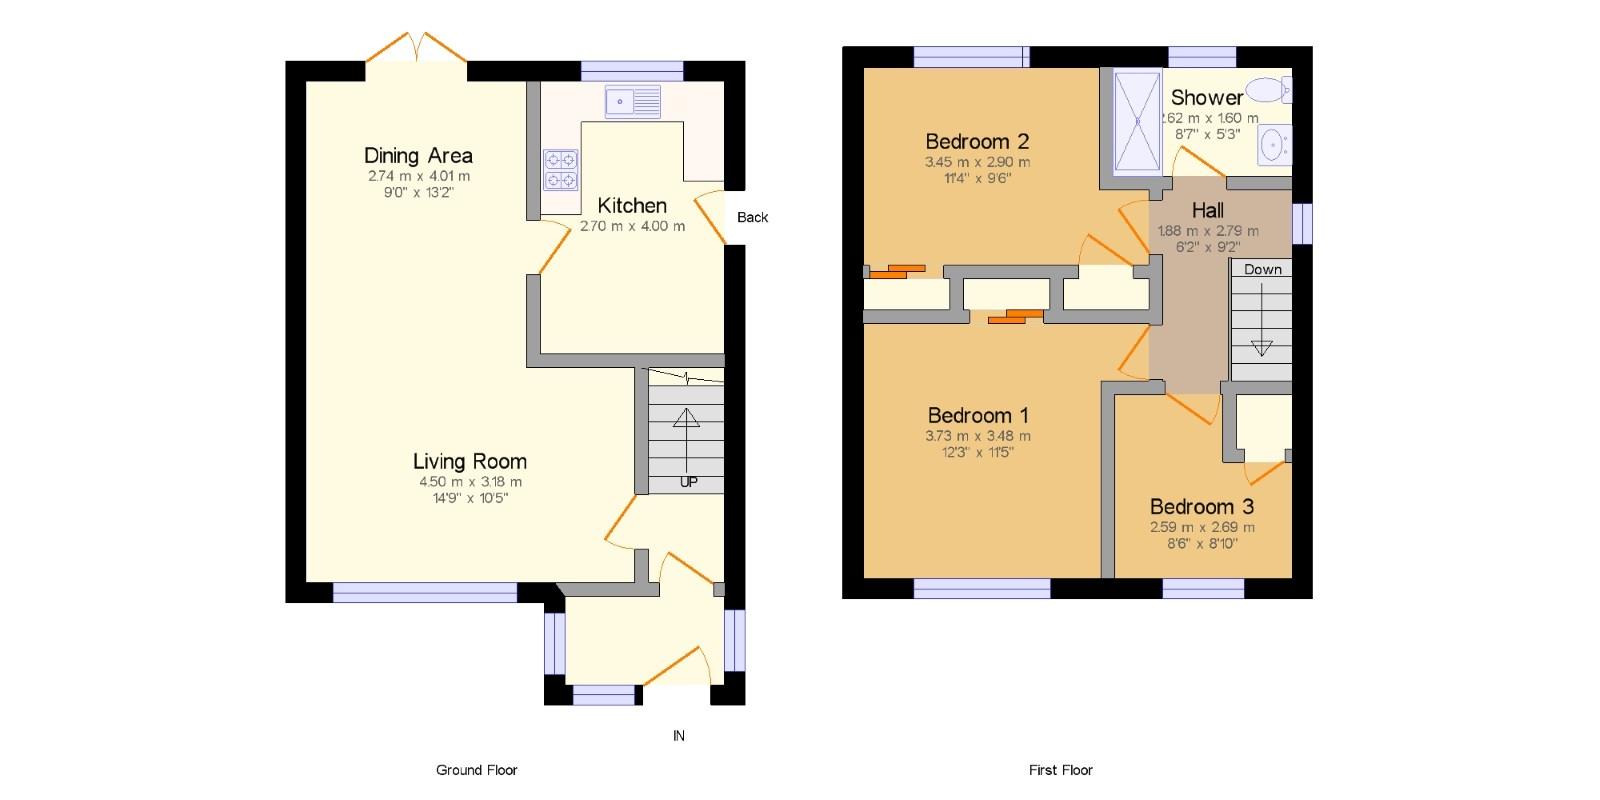 Russell Senate Office Building Floor Plan Extraordinary Hart House Floor Plan Images Best Idea